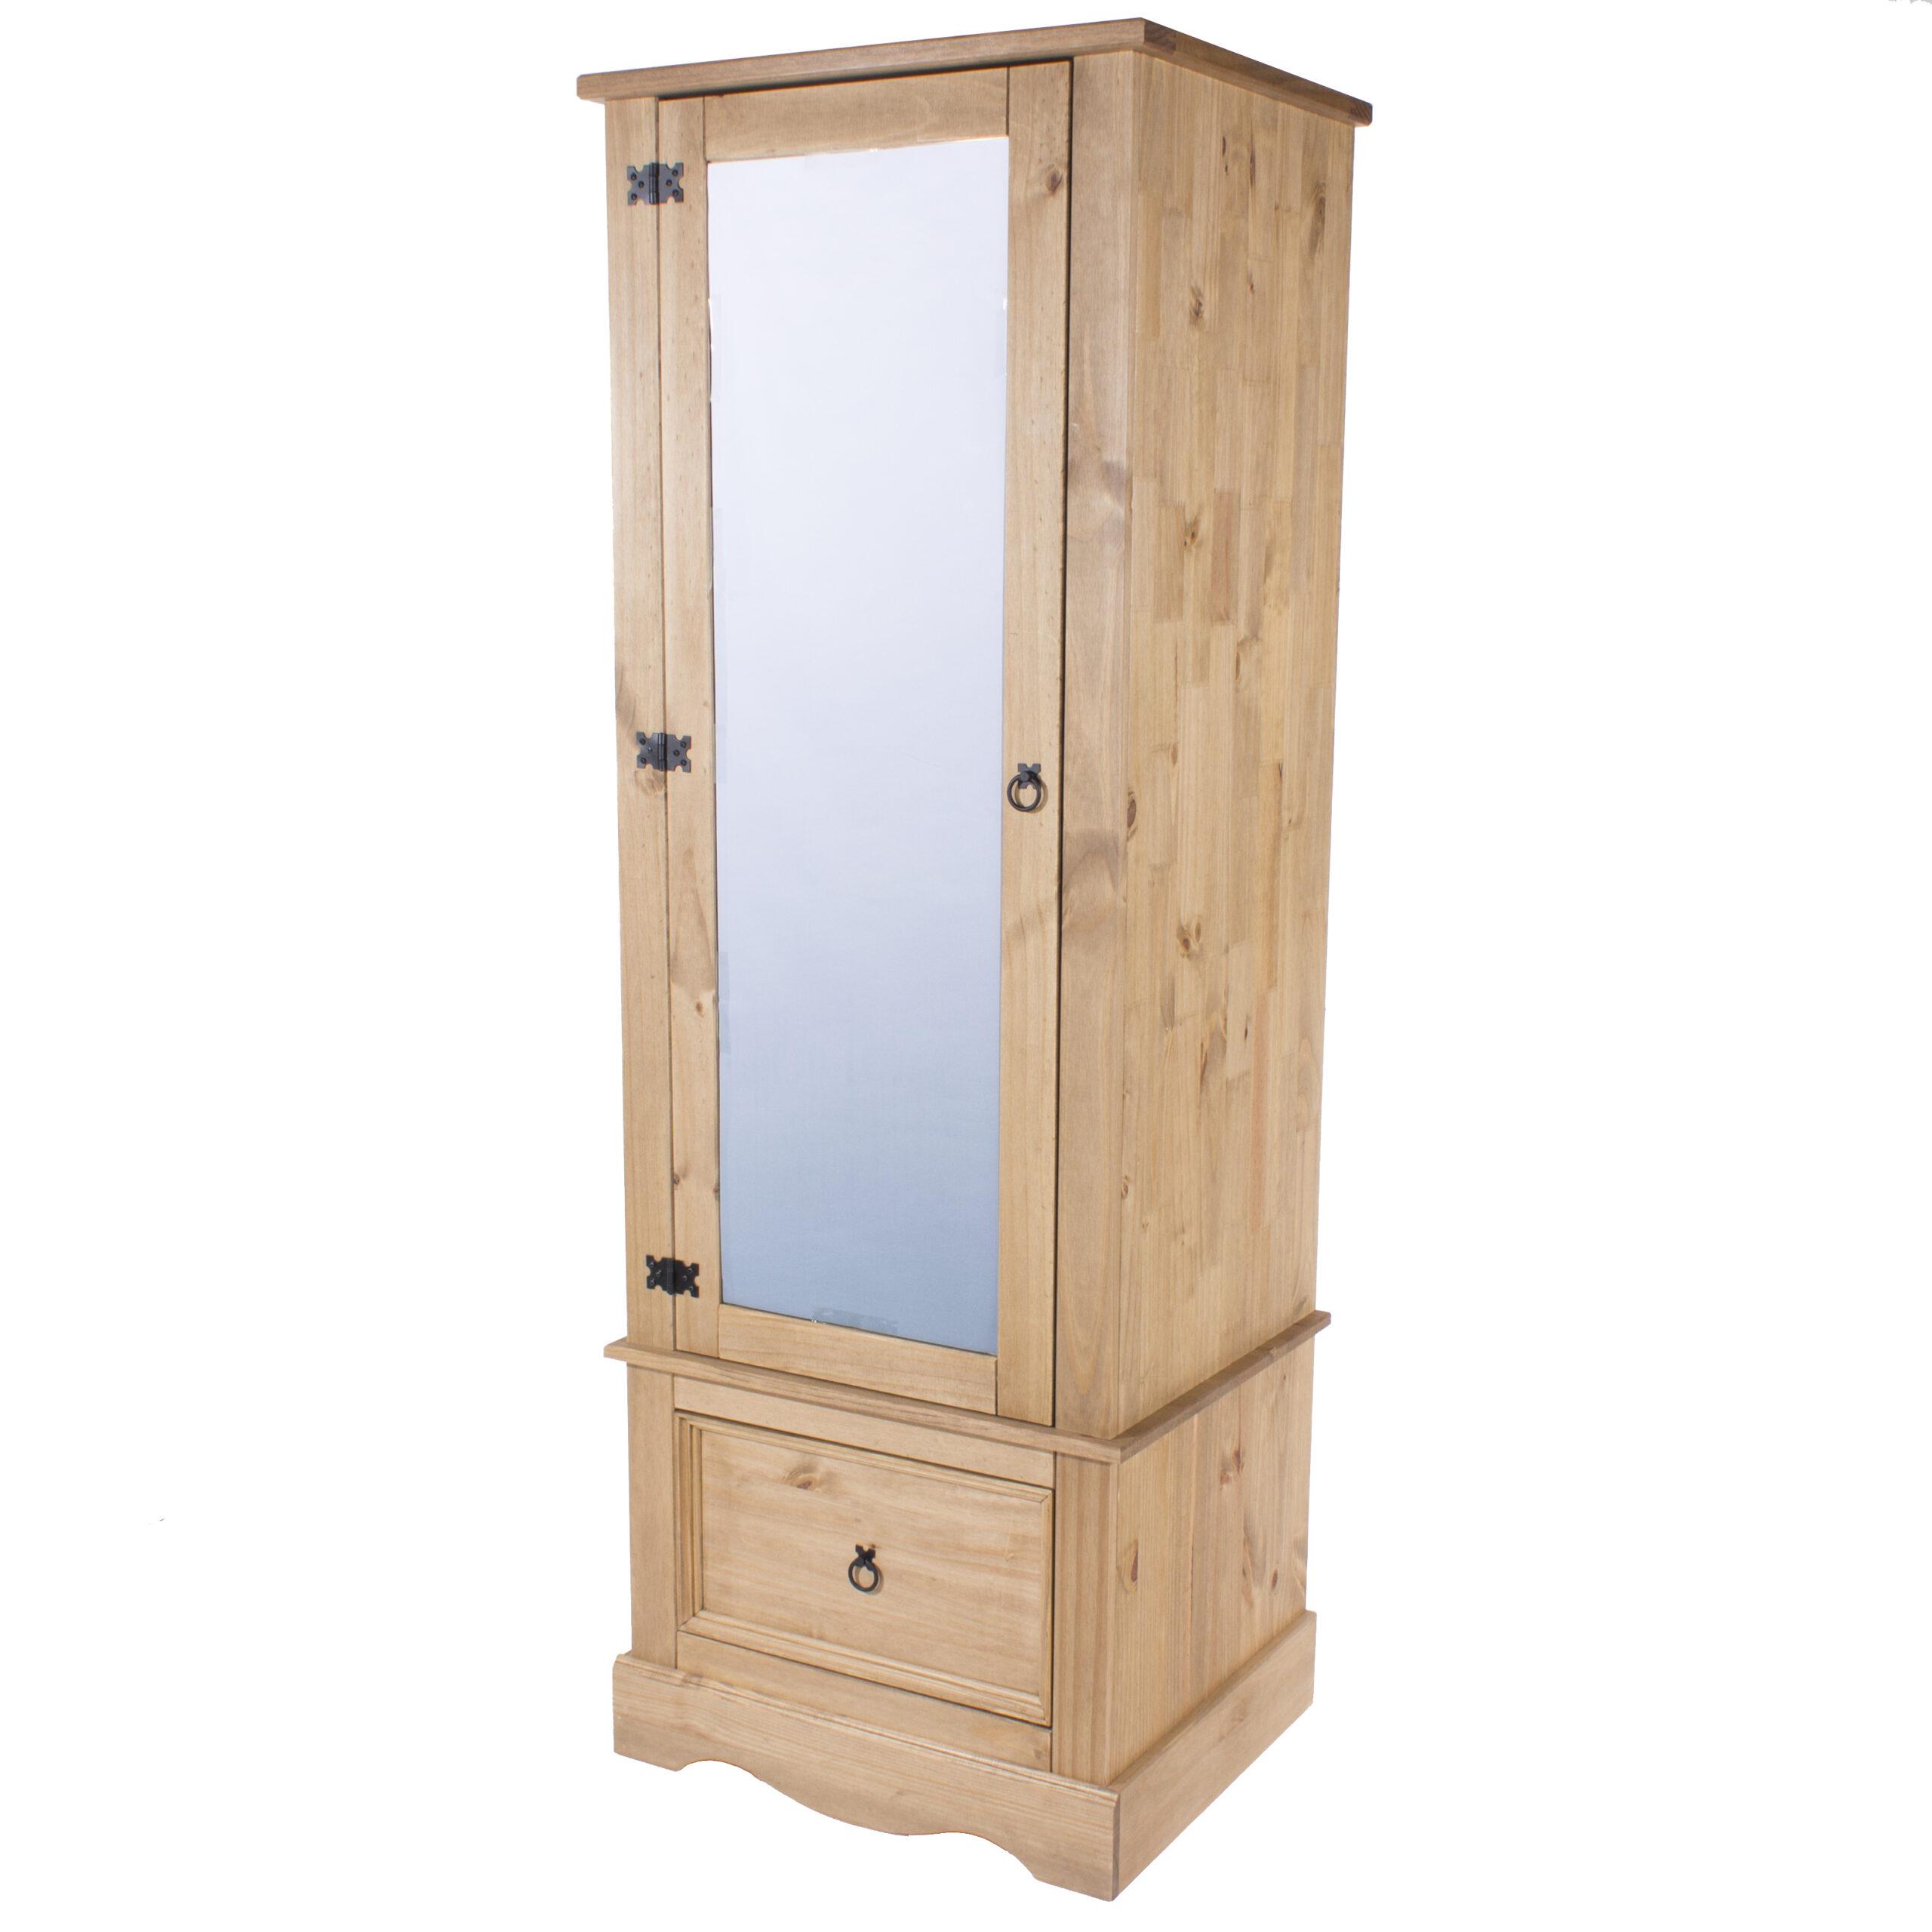 Cortan armoire with mirrored door